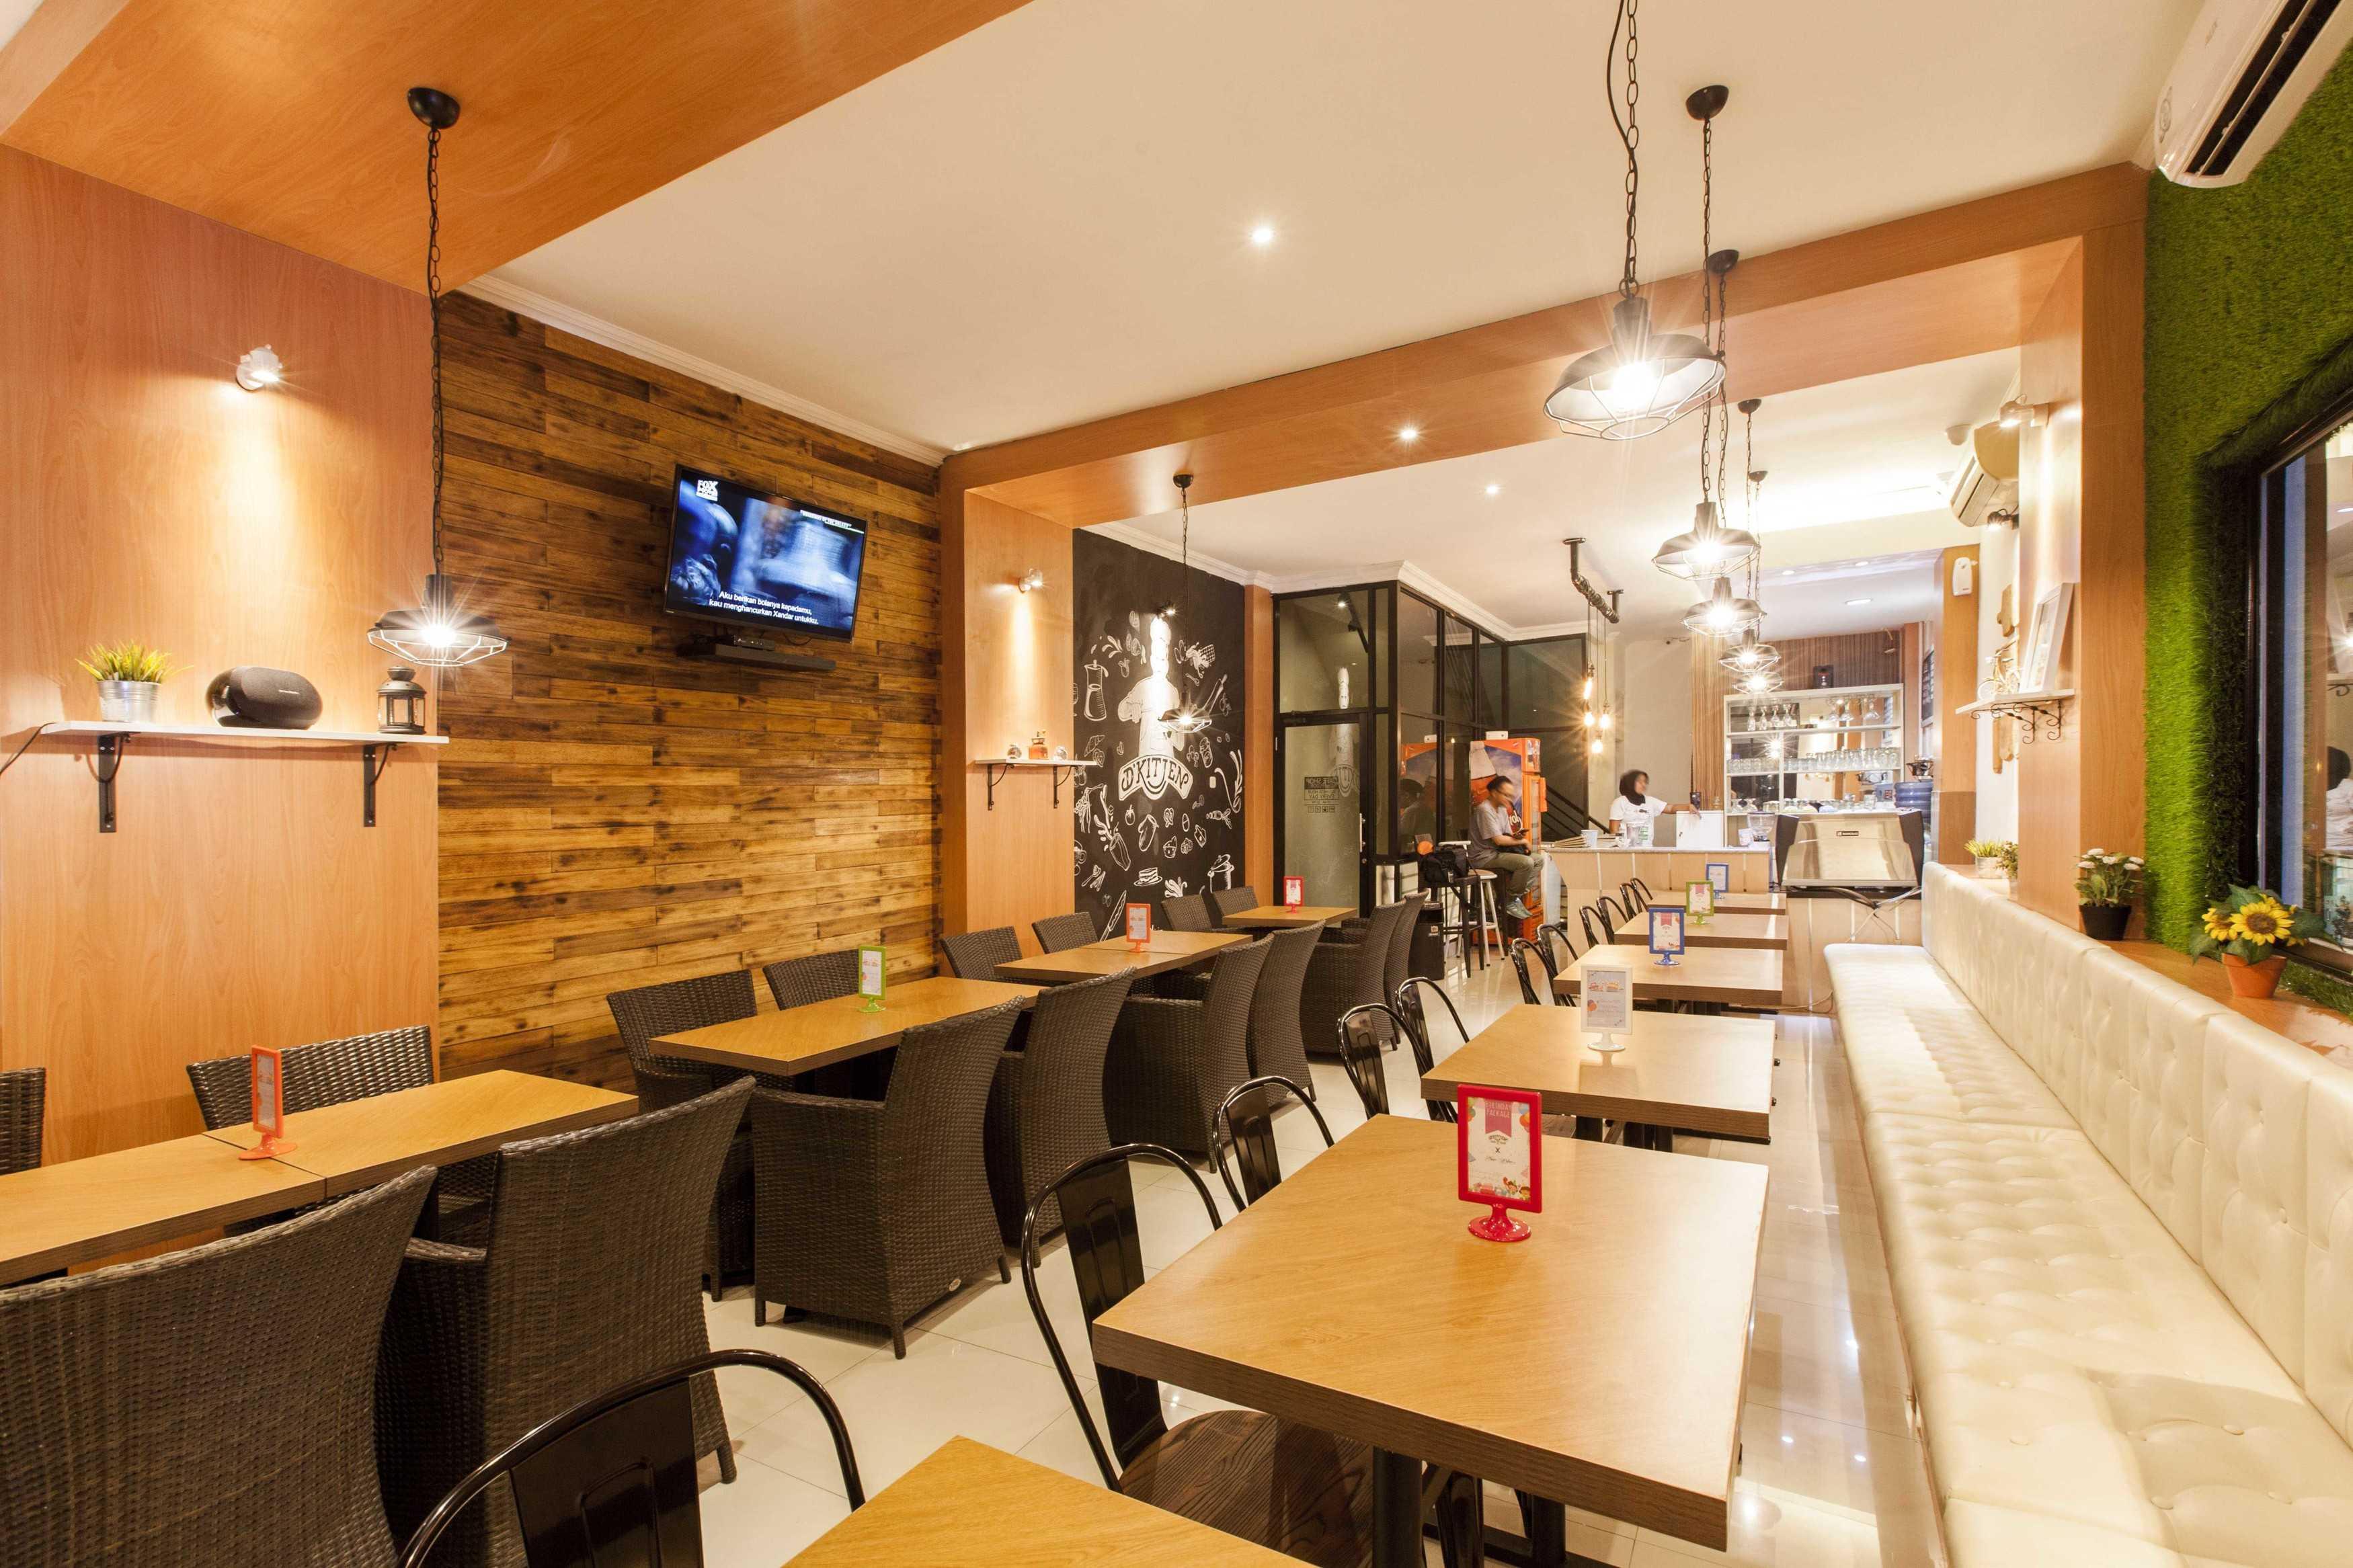 Yardd D'kitjen Cafe Tangerang, Indonesia Tangerang, Indonesia Dining Area Modern  9726